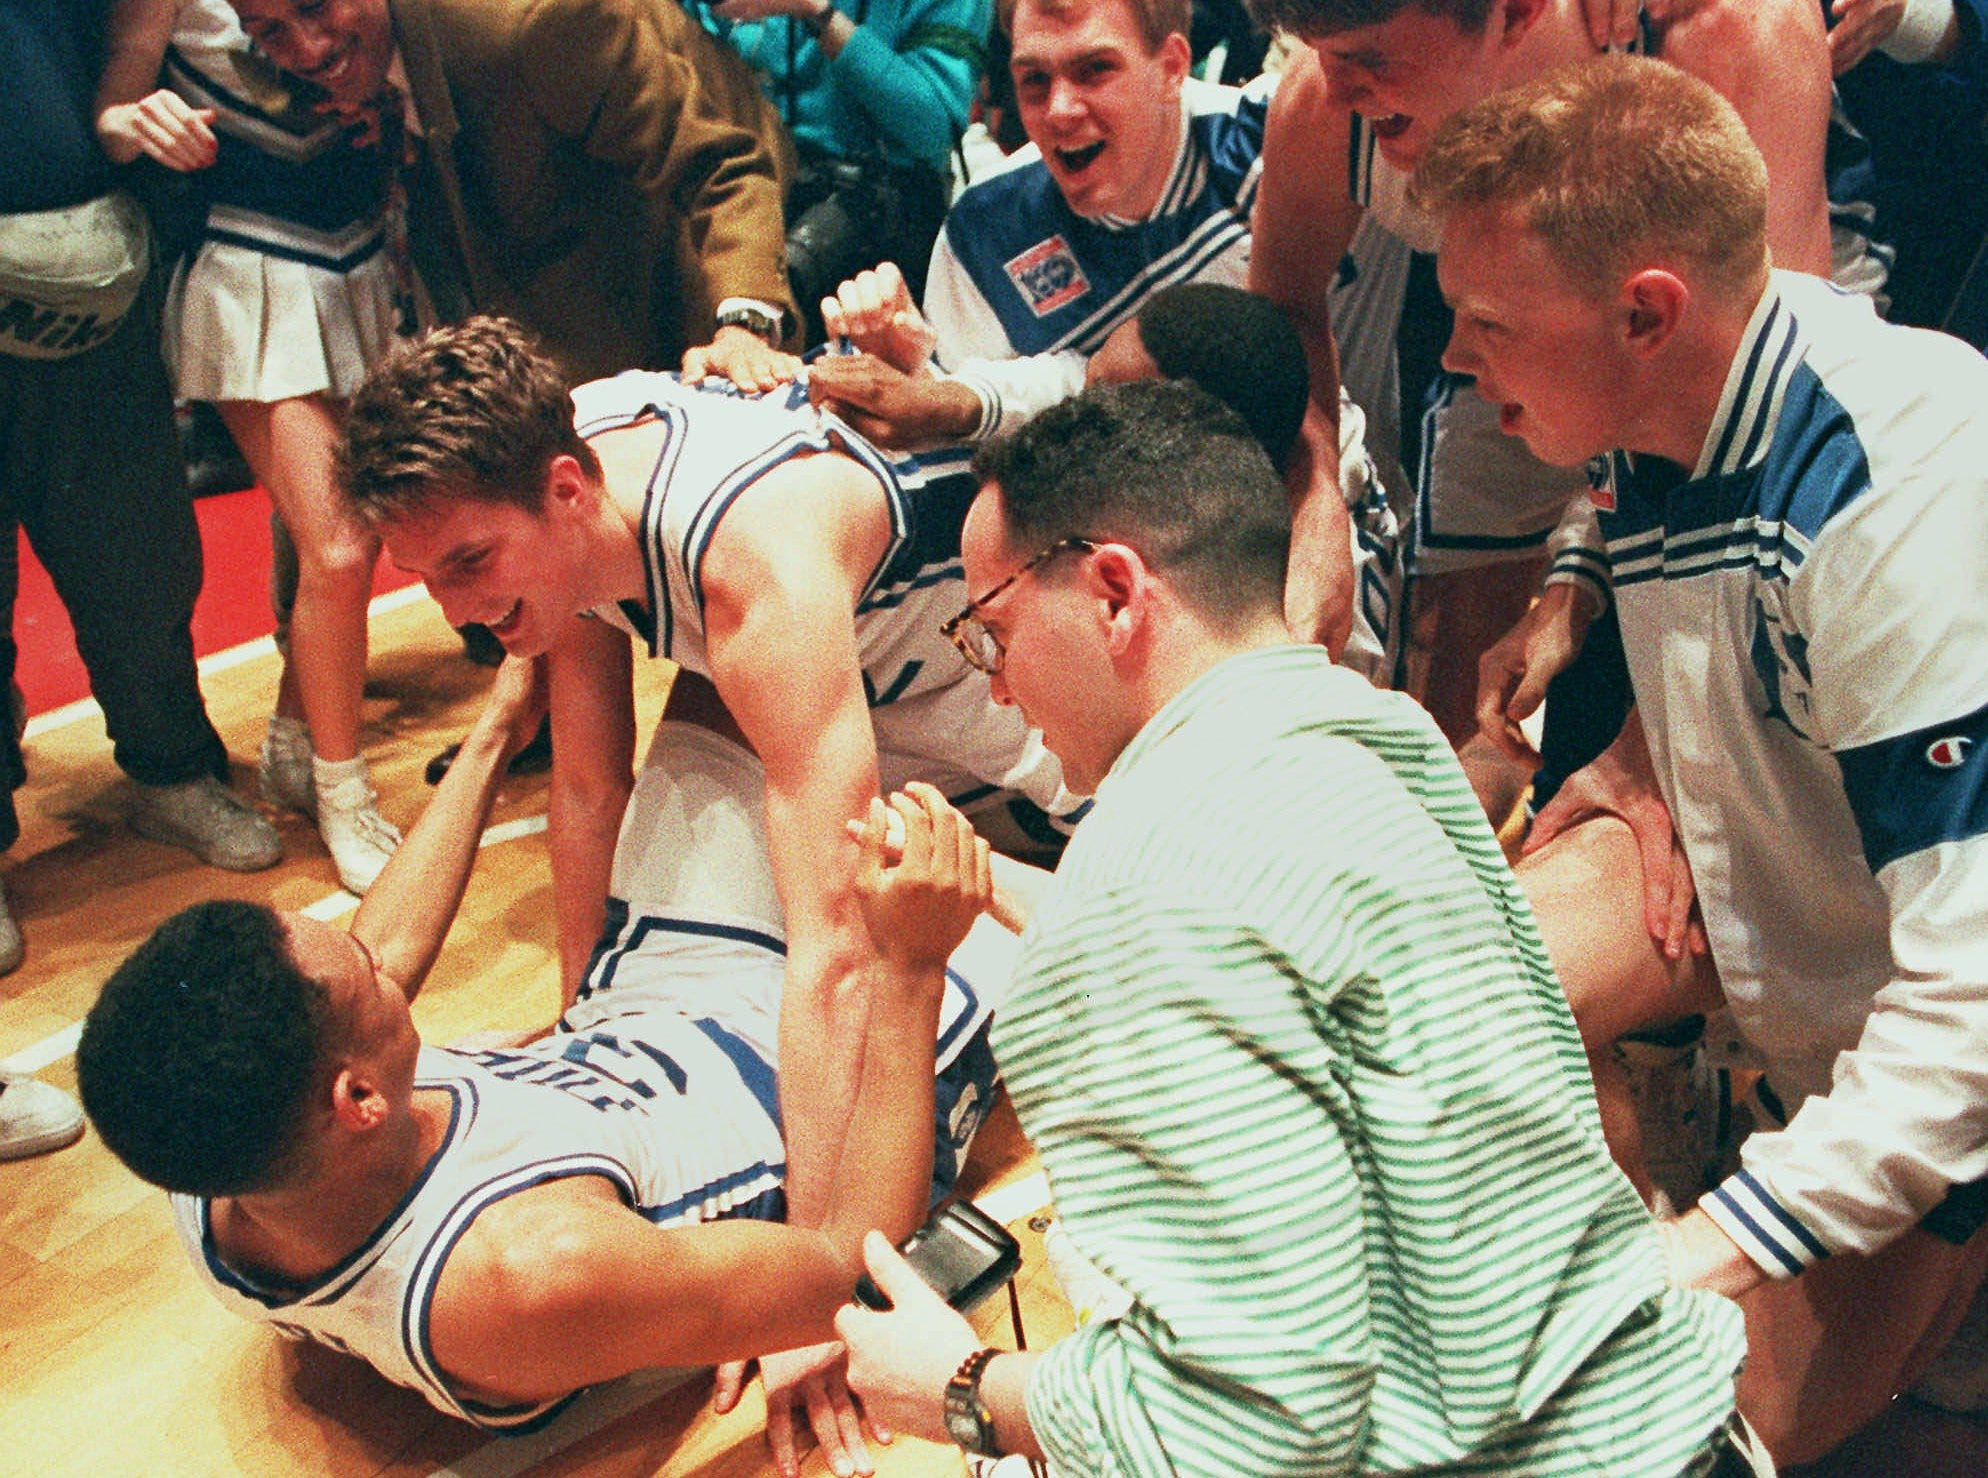 Former Duke star Grant Hill tells story of famous pass to Christian Laettner in 1992 NCAA Tournament win vs. Kentucky